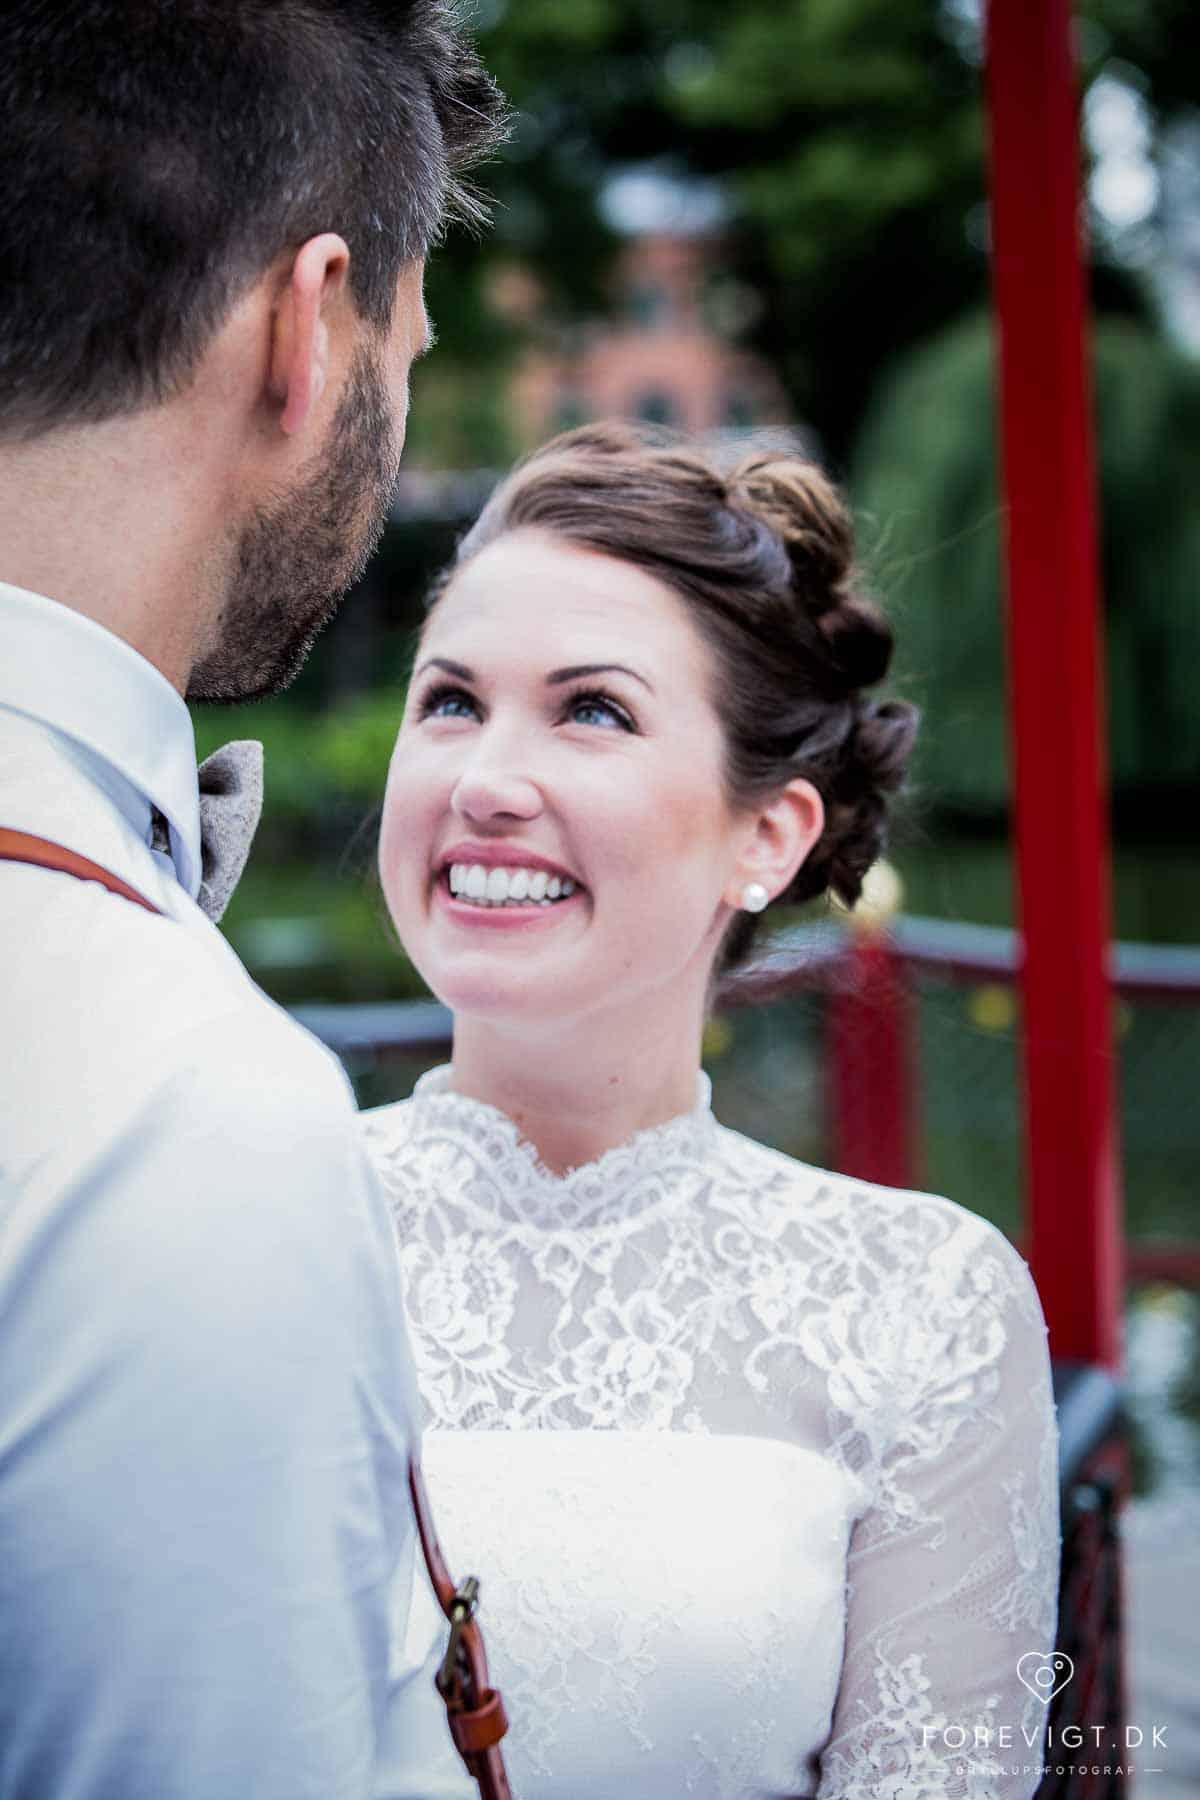 Hold jeres bryllup i Tivoli og få en uforglemmelig dag i eventyrlige omgivelser